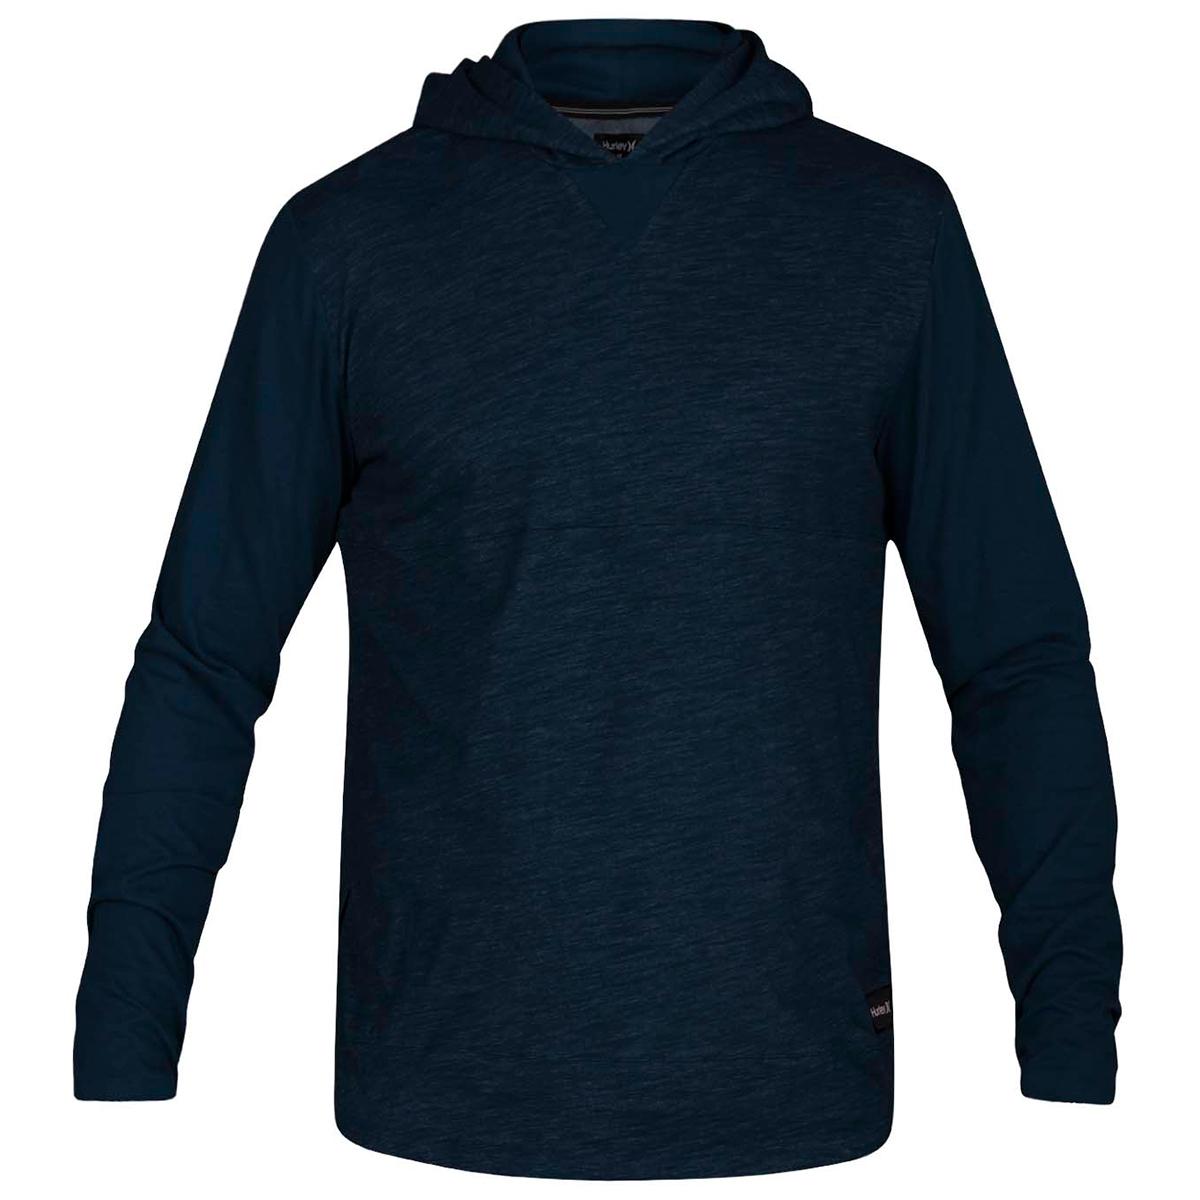 Hurley Men's Dri-Fit Lagos Pullover Hoodie - Blue, L